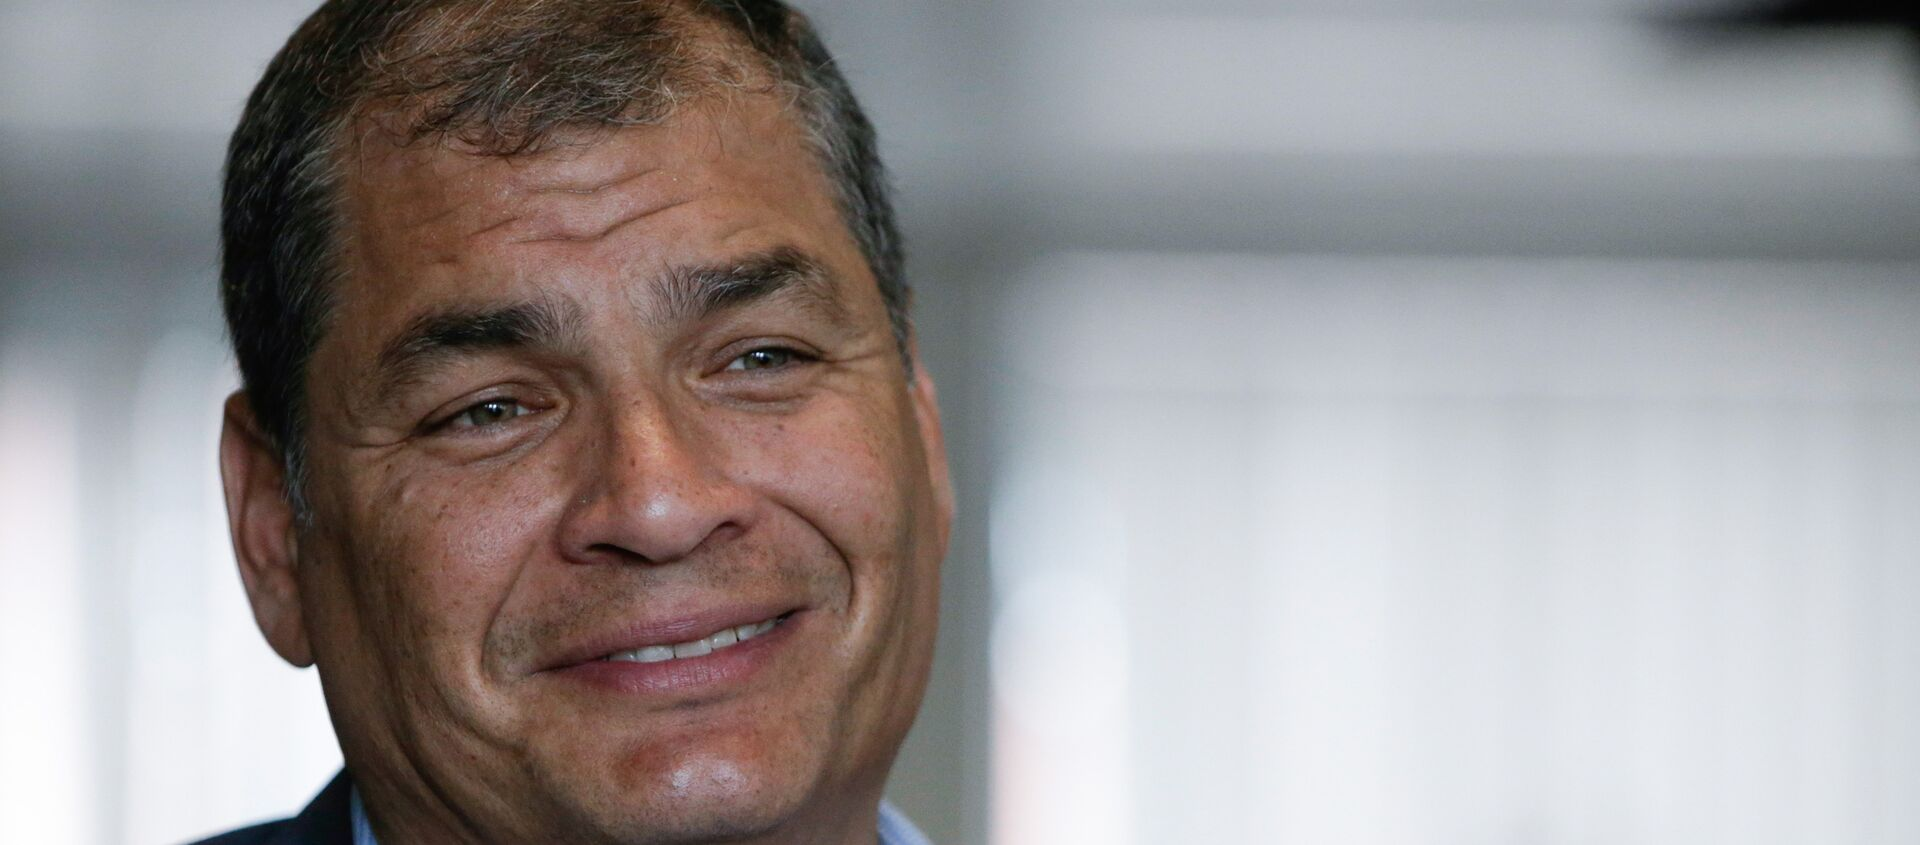 El expresidente de Ecuador, Rafael Correa. - Sputnik Mundo, 1920, 04.07.2018